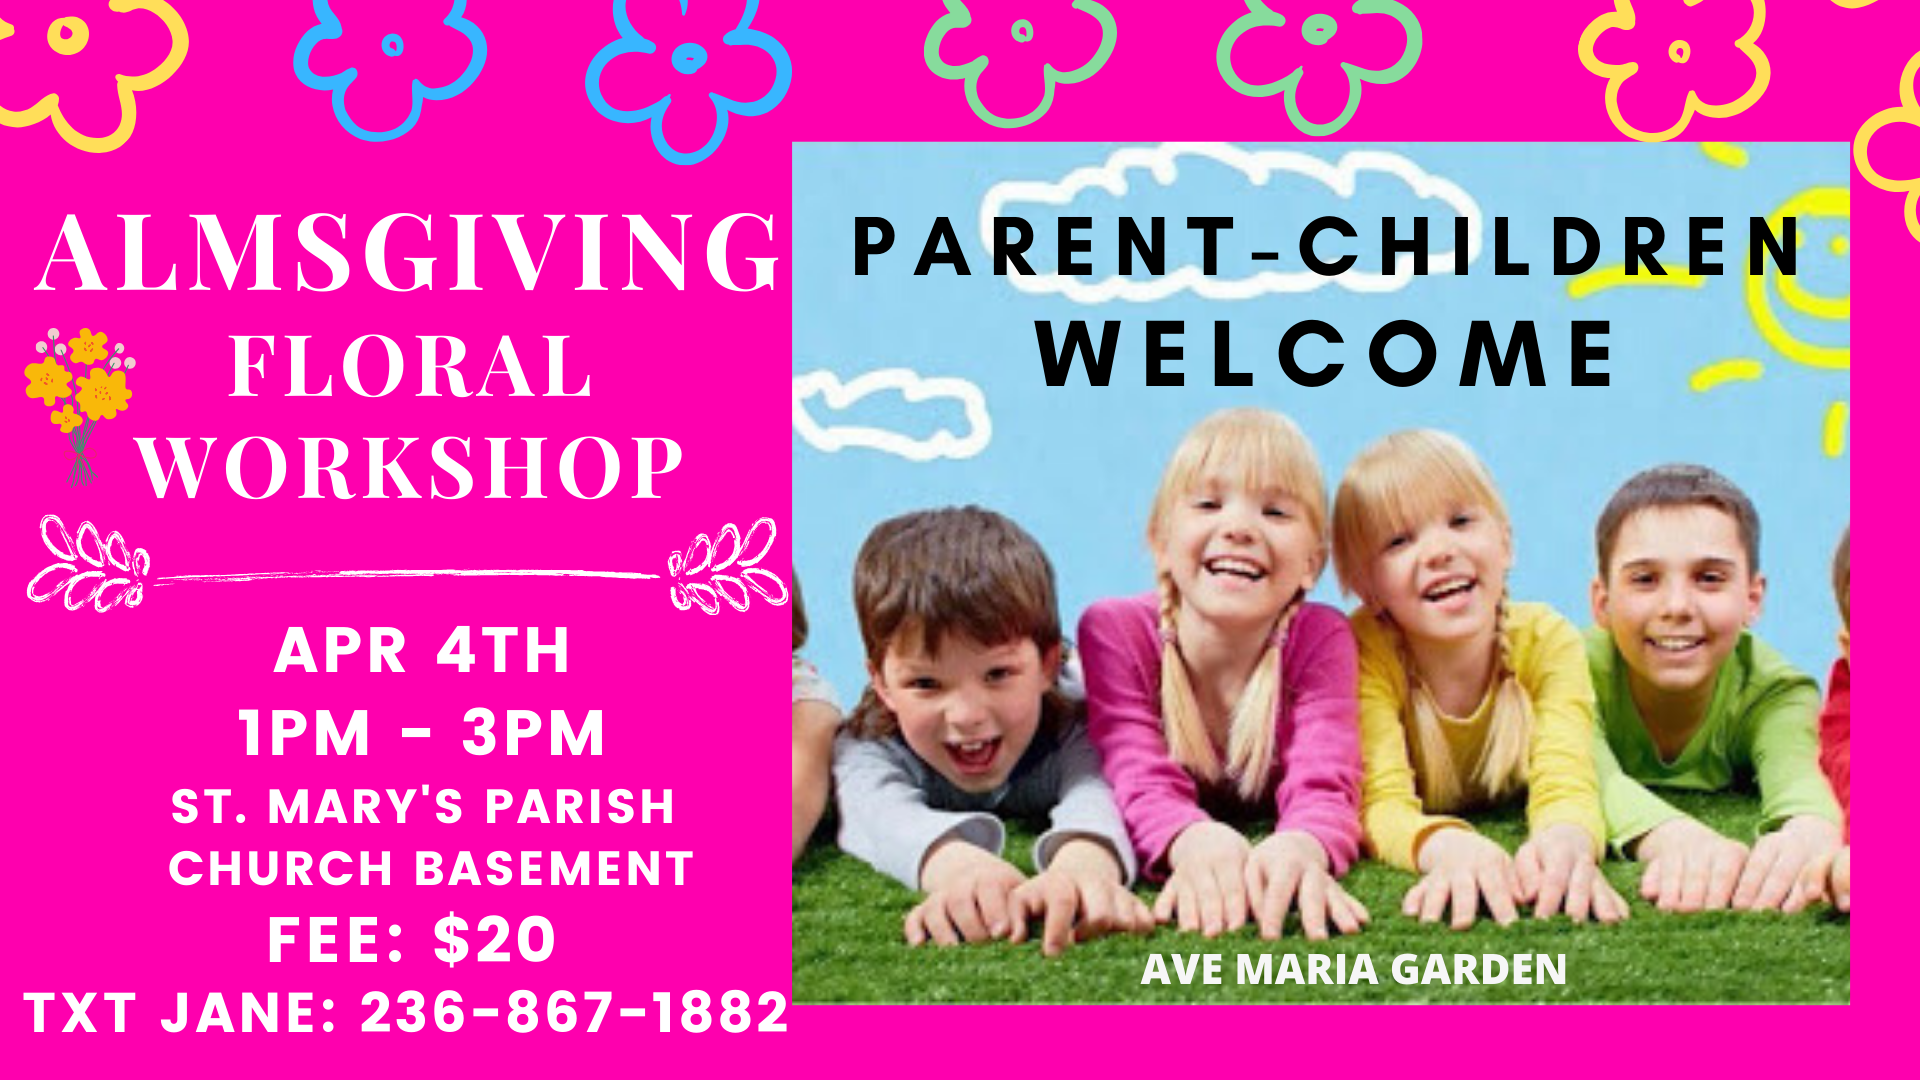 Parent-Child Floral Almsgiving Workshop @ St. Mary's Parish - Ave Maria Garden